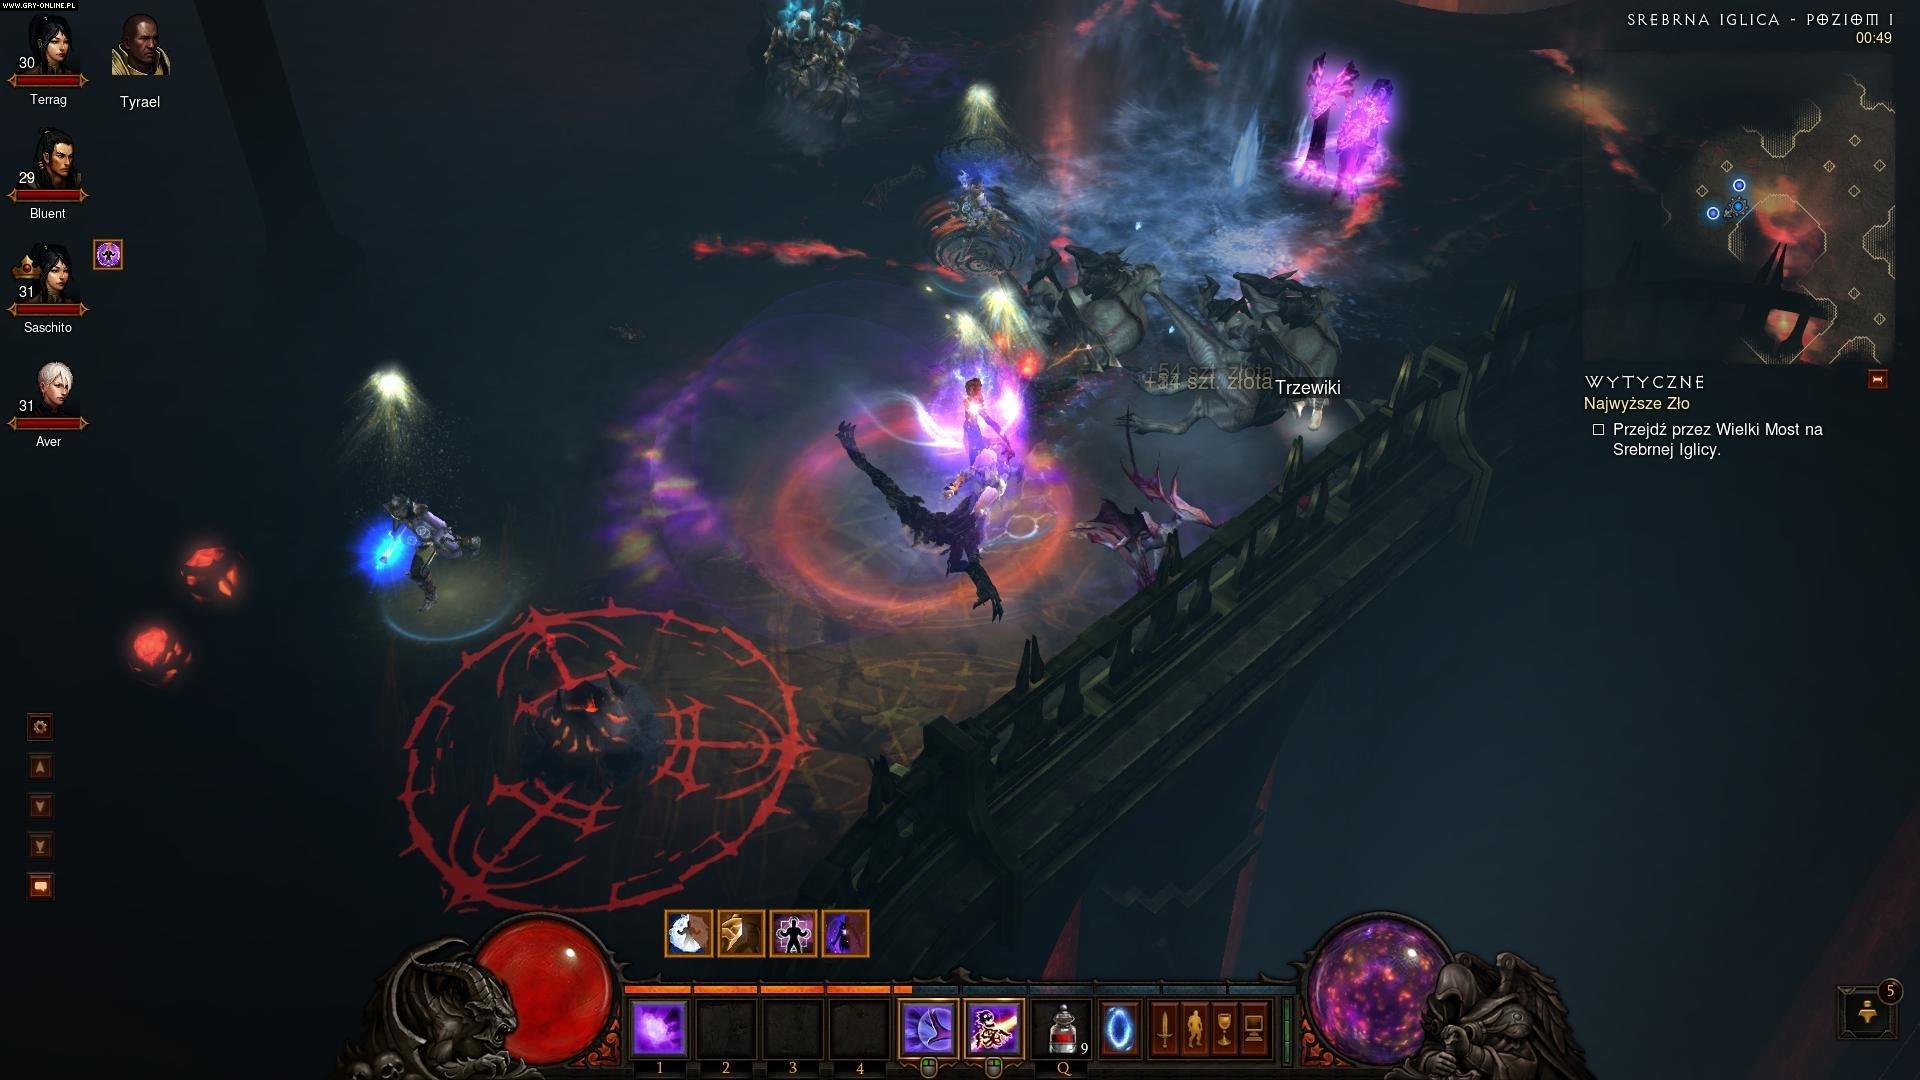 585146375.jpg - Diablo 3